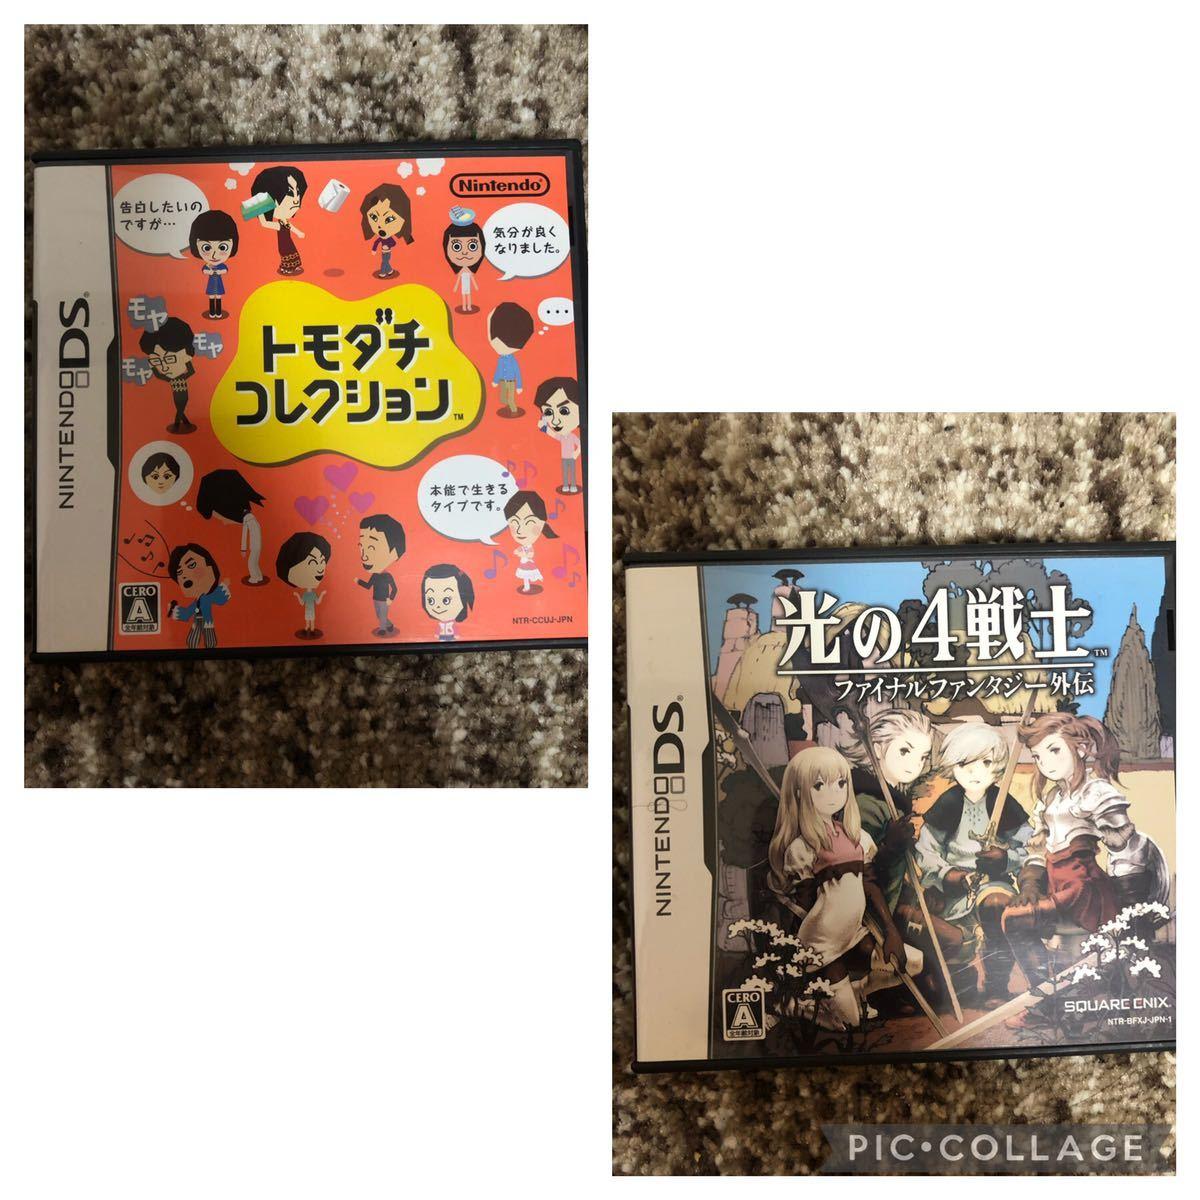 DSソフト ファイナルファンタジー外伝 光の4戦士 トモダチコレクション Nintendo ニンテンドー 任天堂